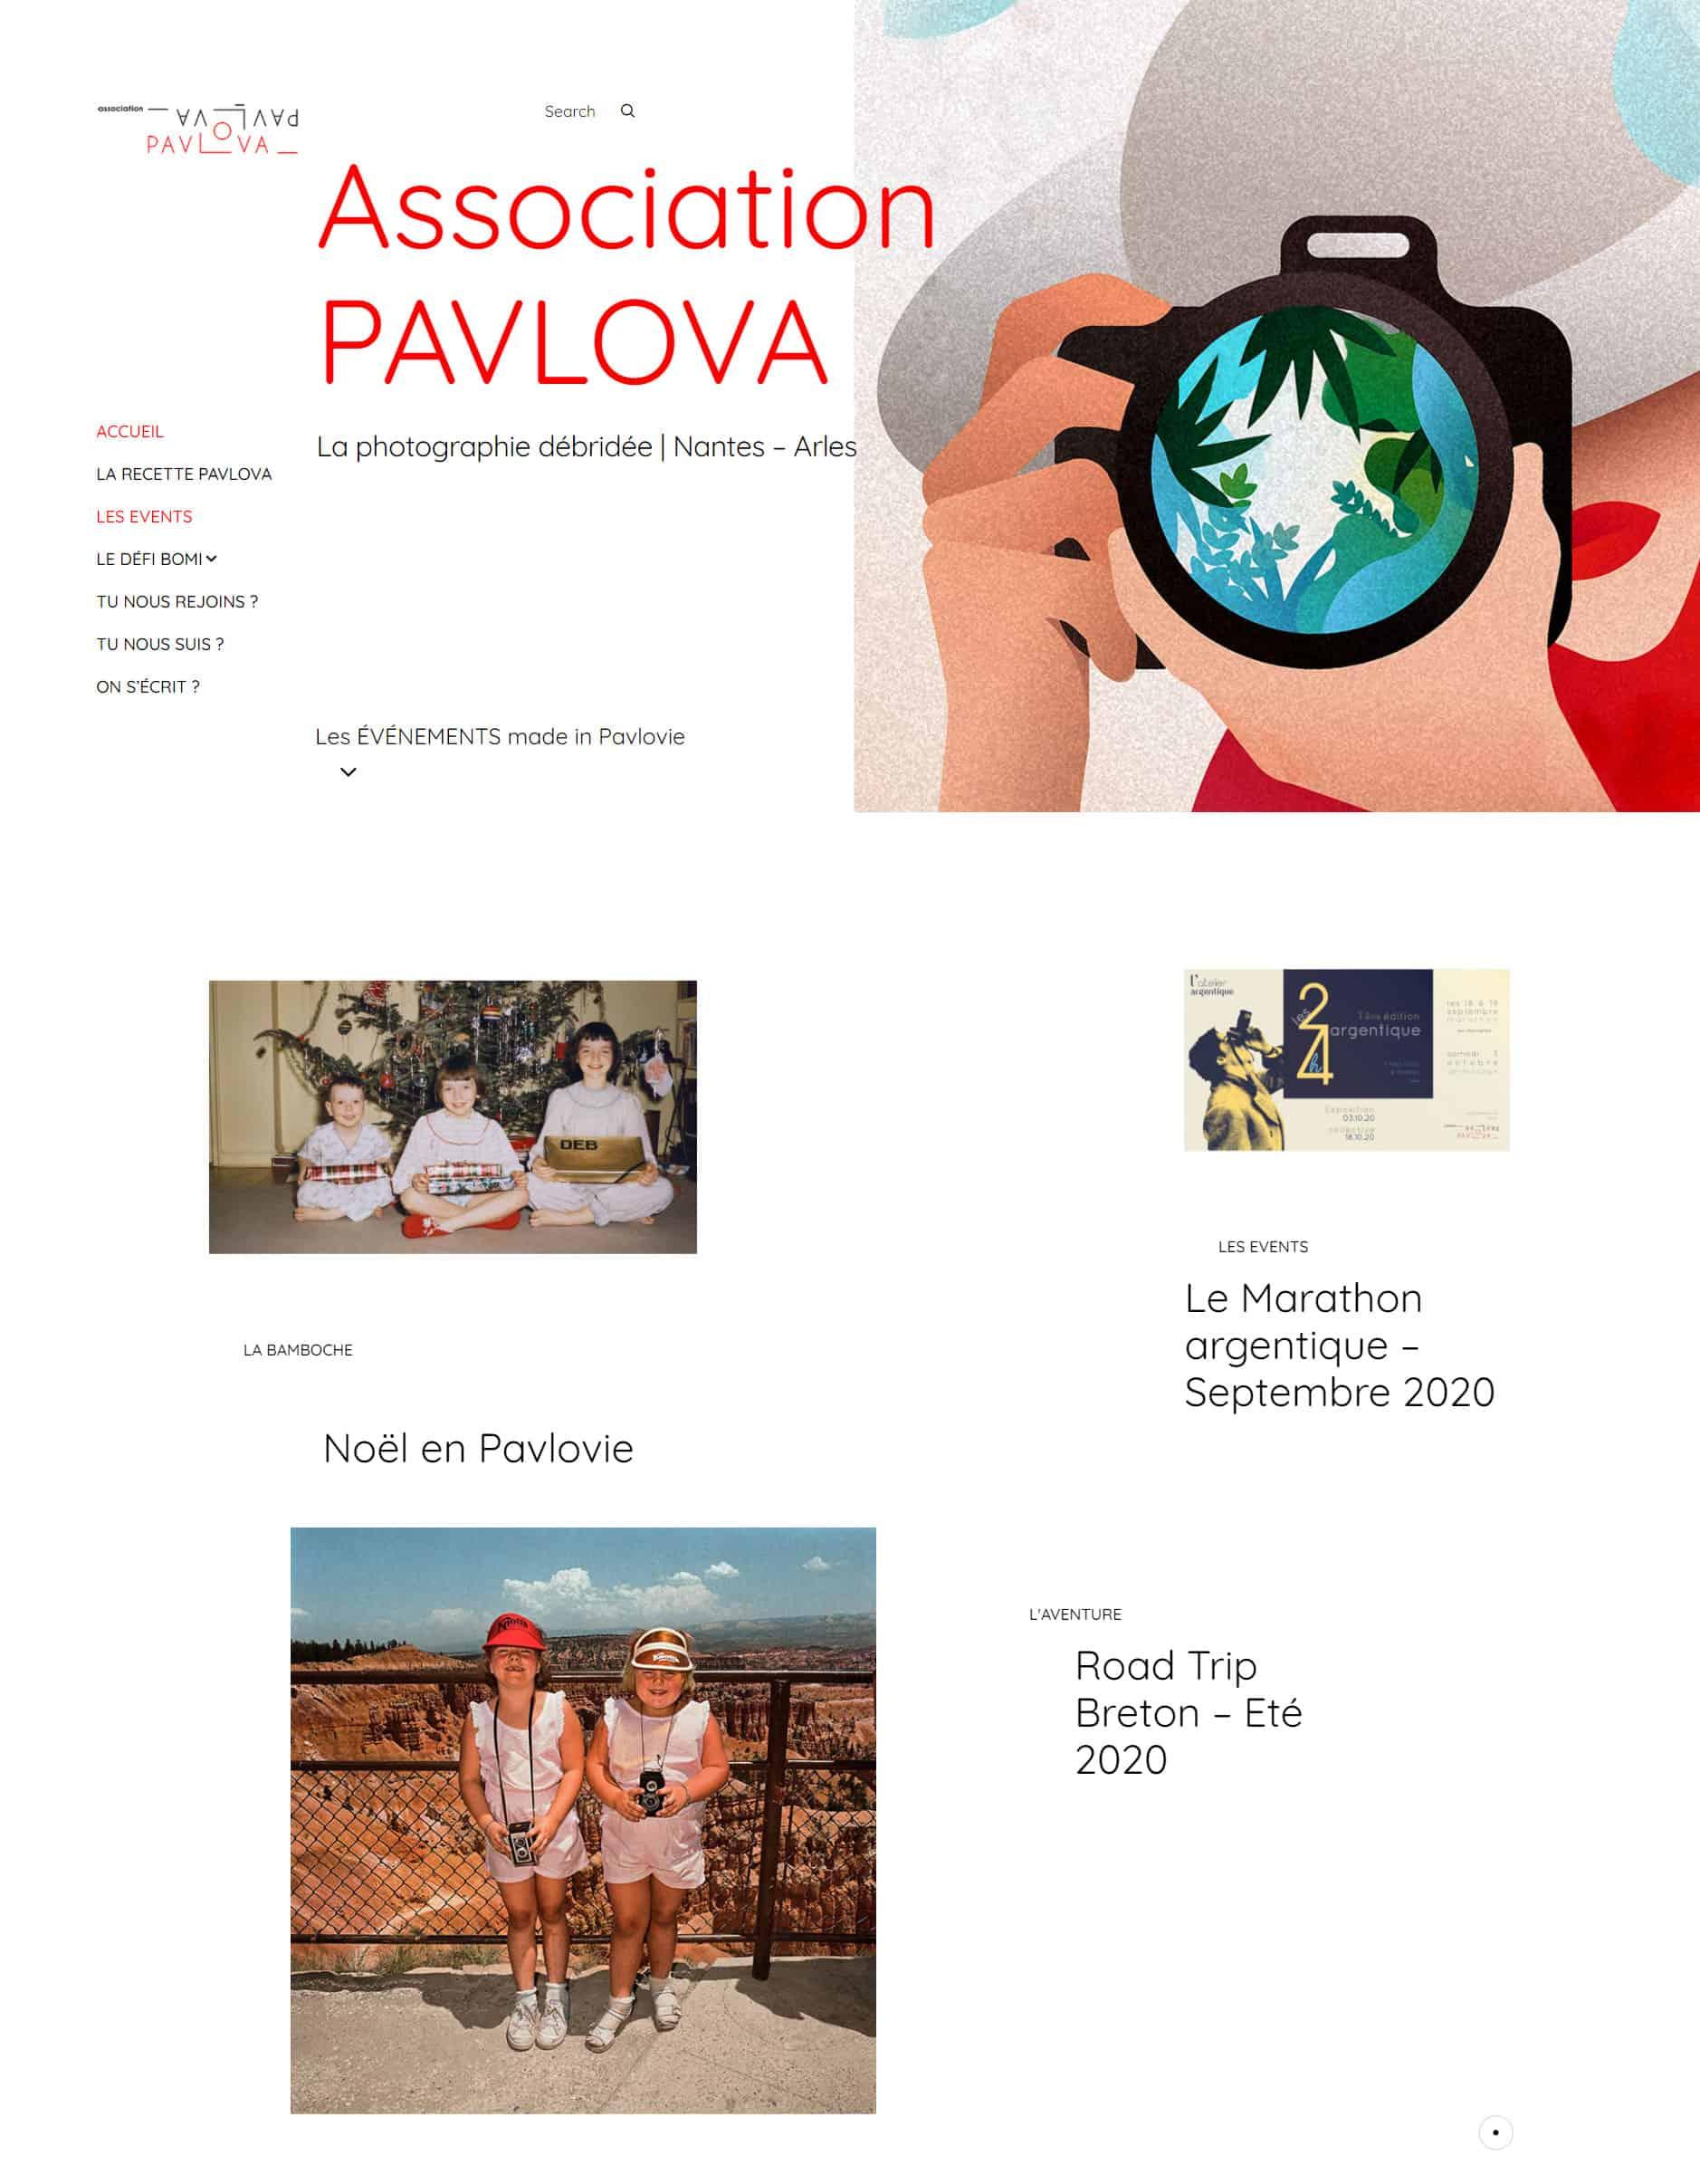 Association Pavlova